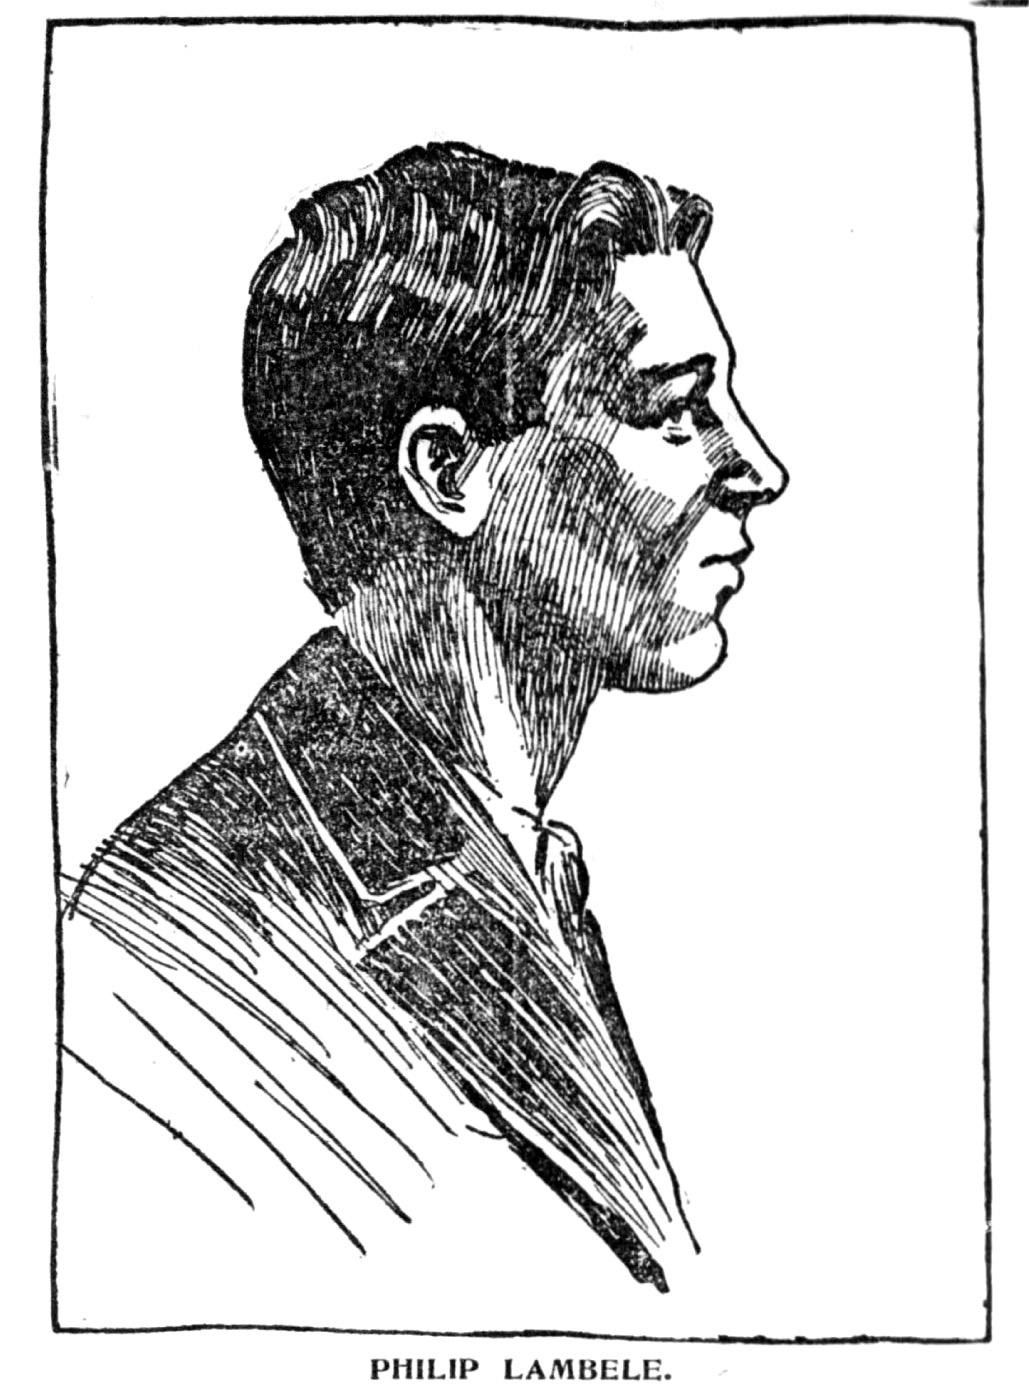 Drawing of Lambele - Newspapers.com